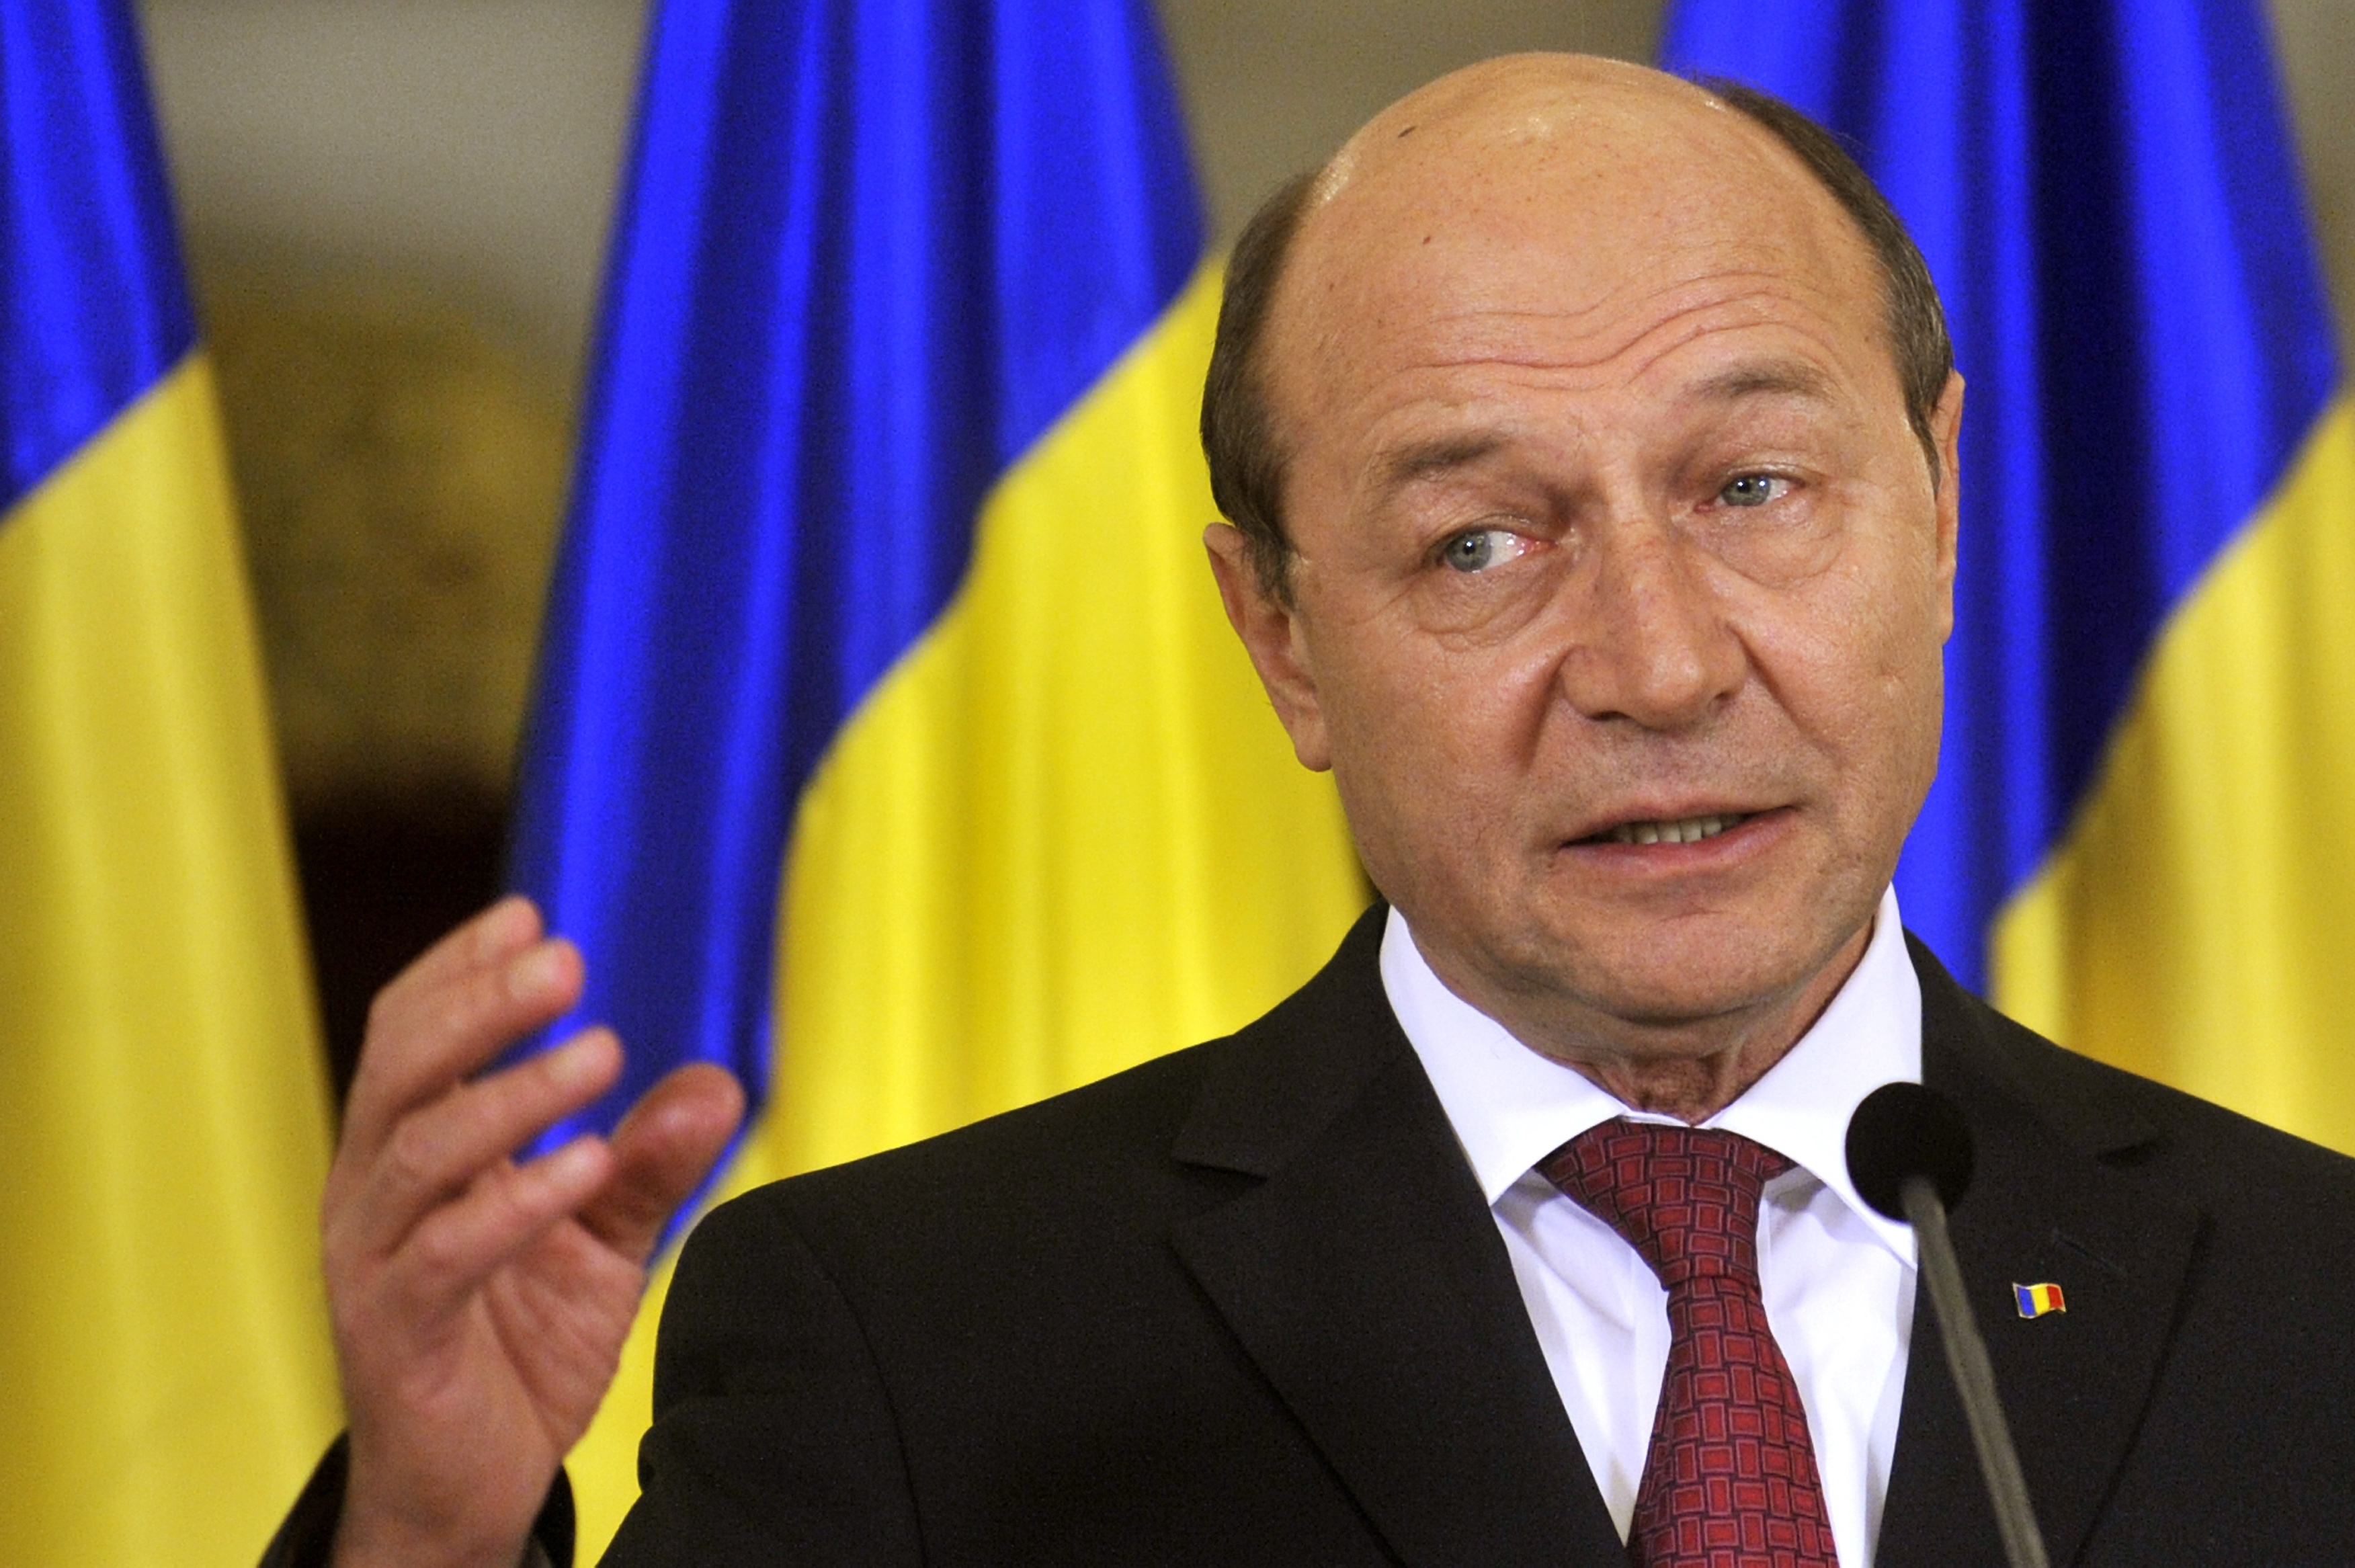 Traian Băsescu - Wikipedia, la enciclopedia libre  |Traian Basescu